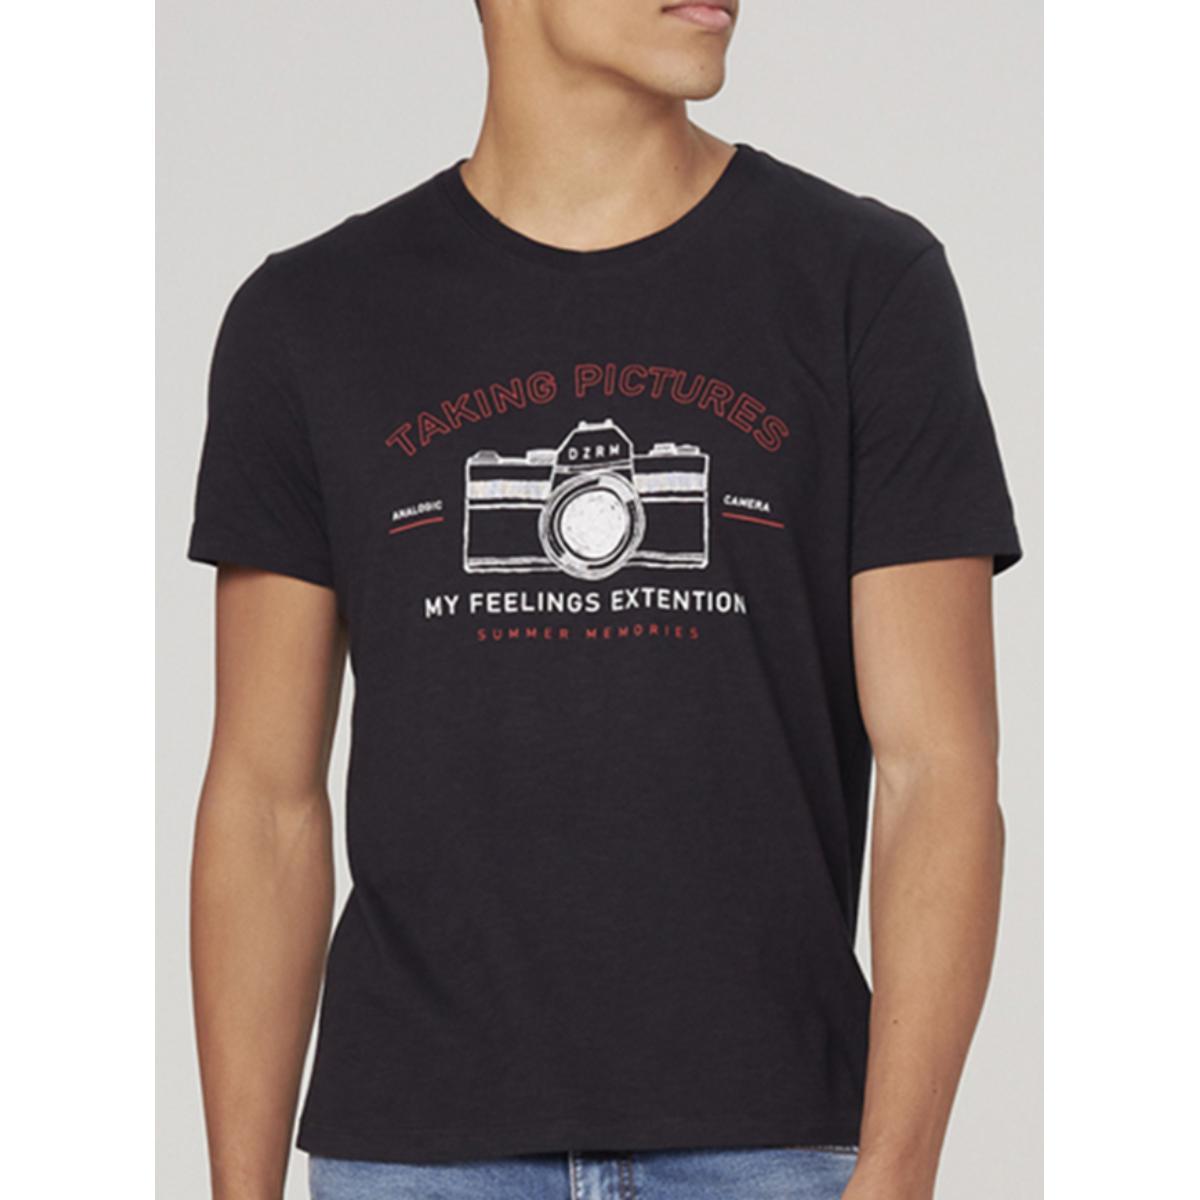 Camiseta Masculina Dzarm 6r7m N10en Preto